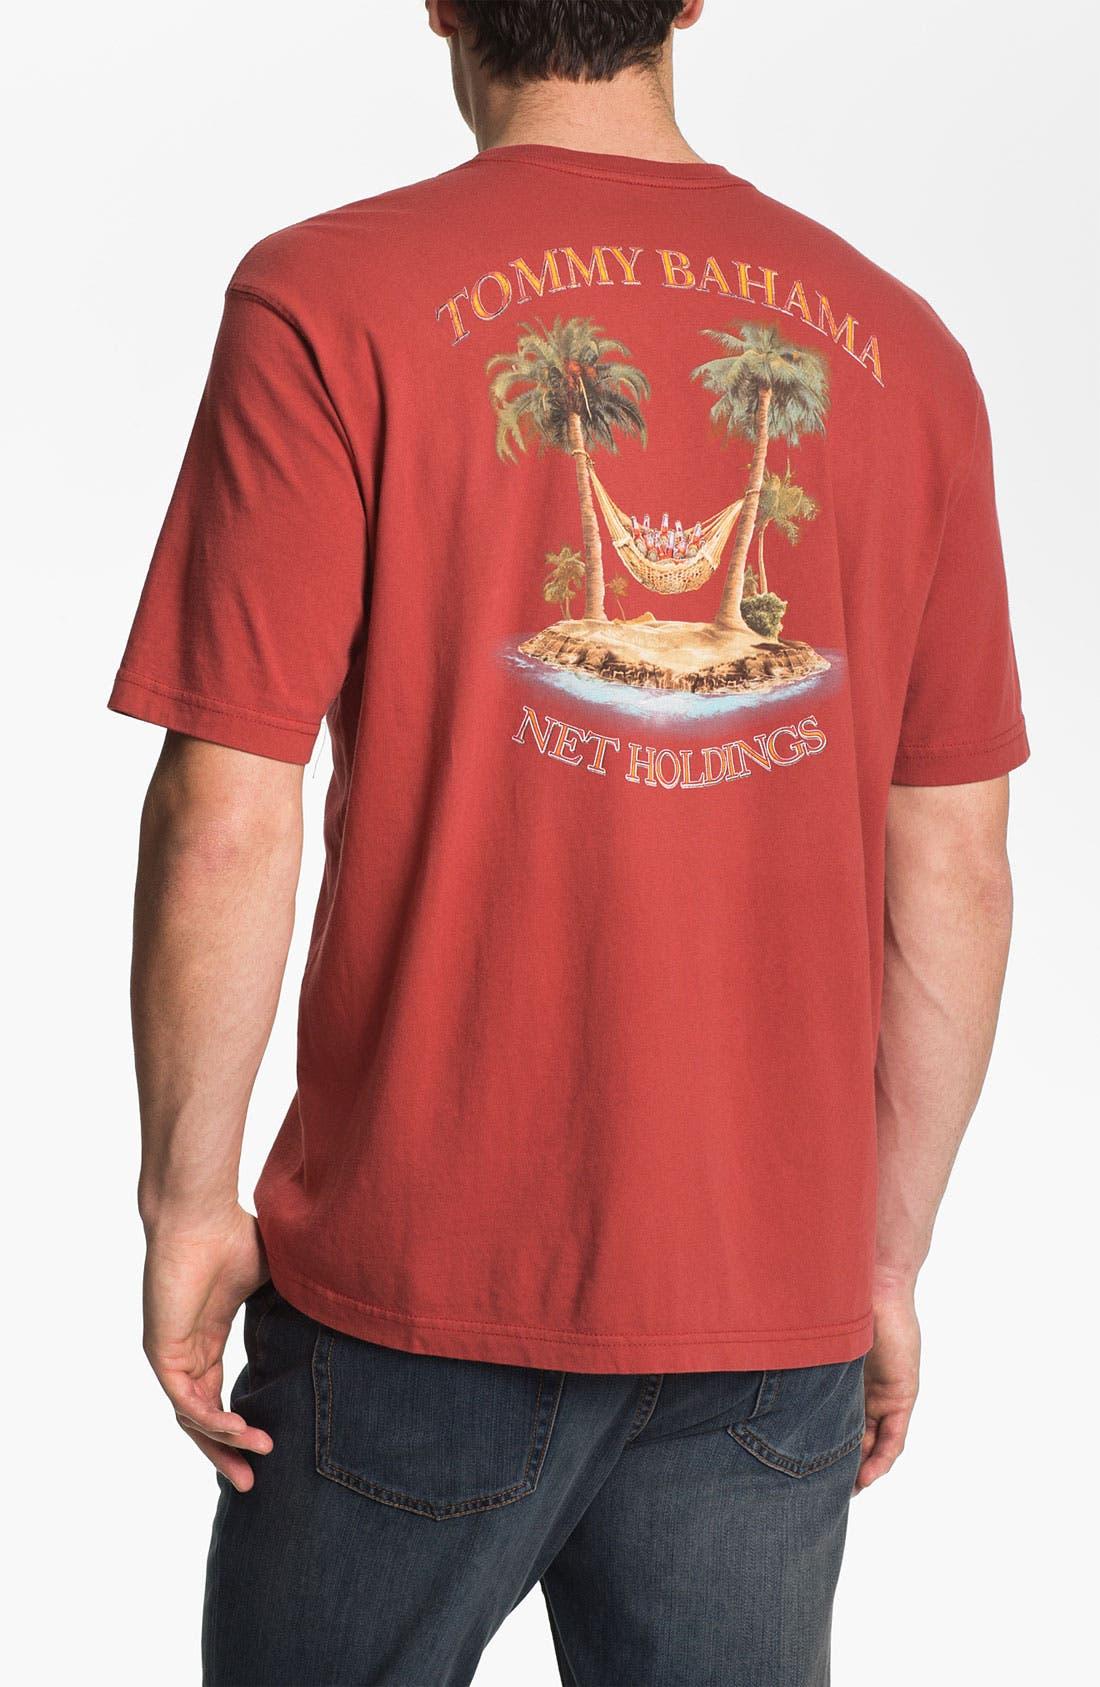 Main Image - Tommy Bahama 'Net Holdings' T-Shirt